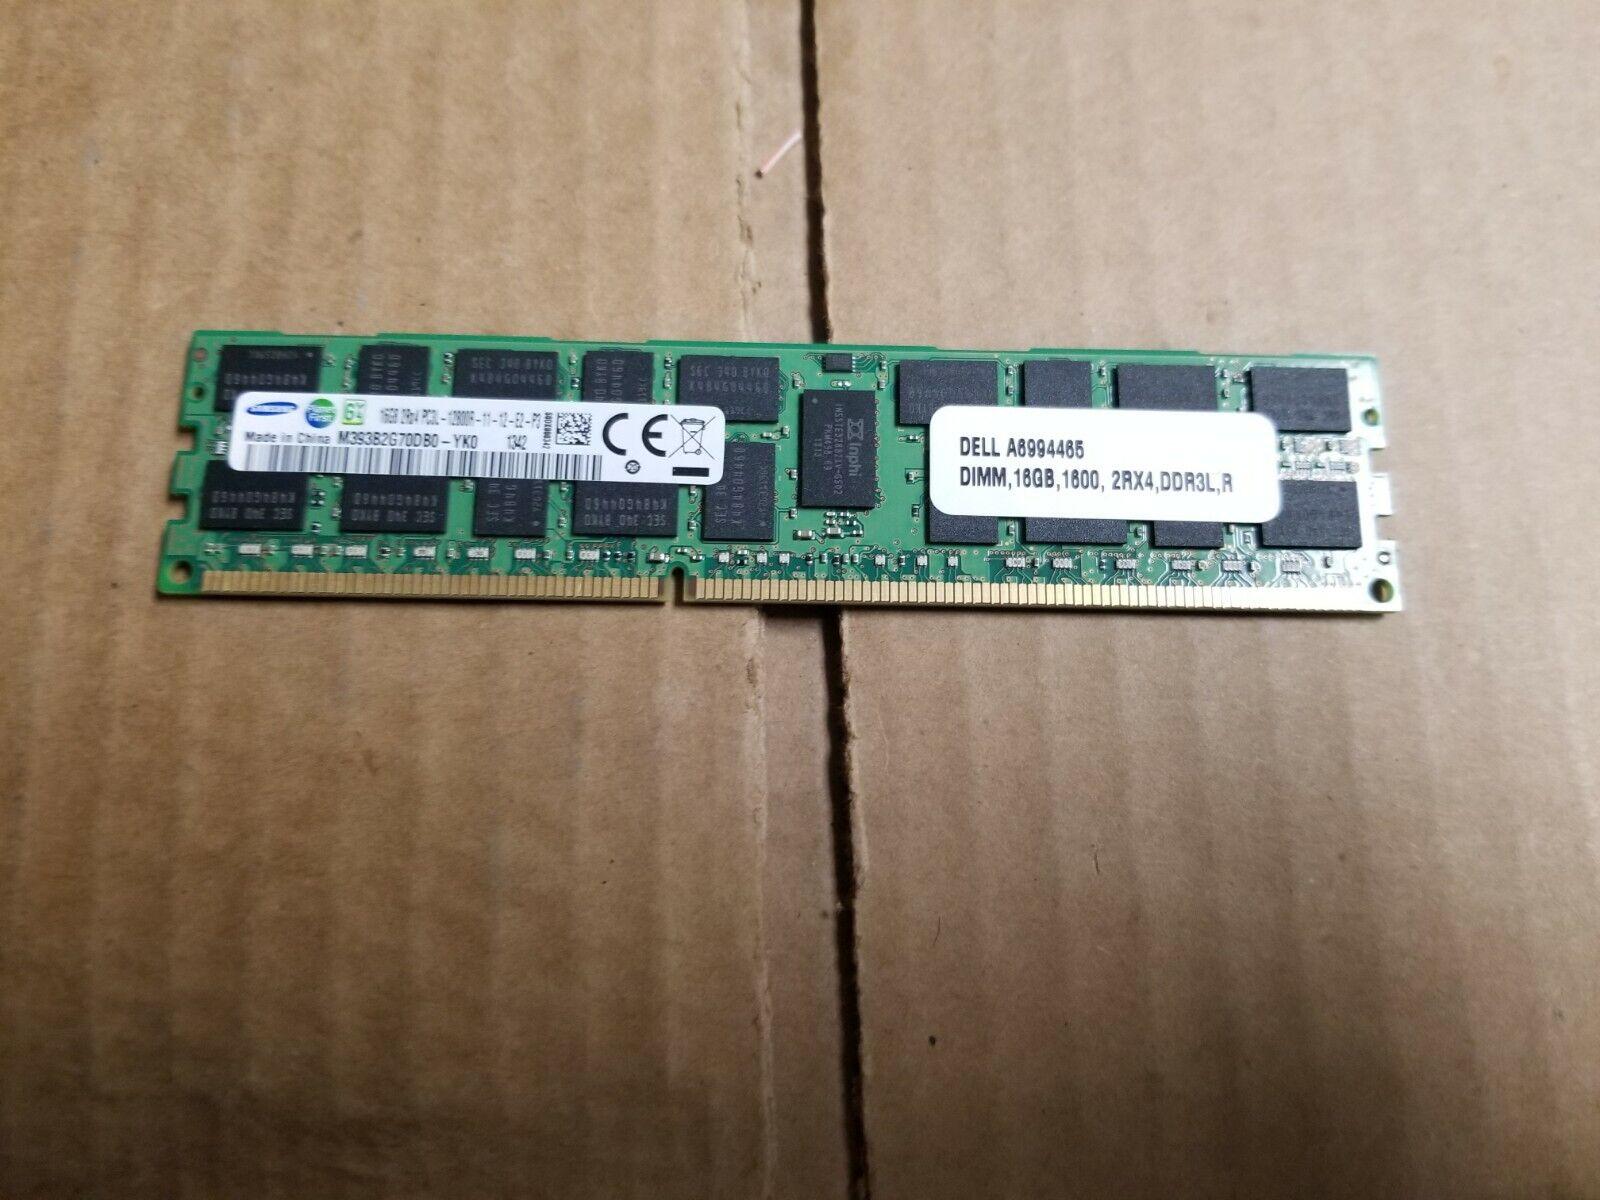 1X16GB 2RX4 PC3L-12800R MEMORY SAMSUNG M393B2G70DB0-YK0 16GB